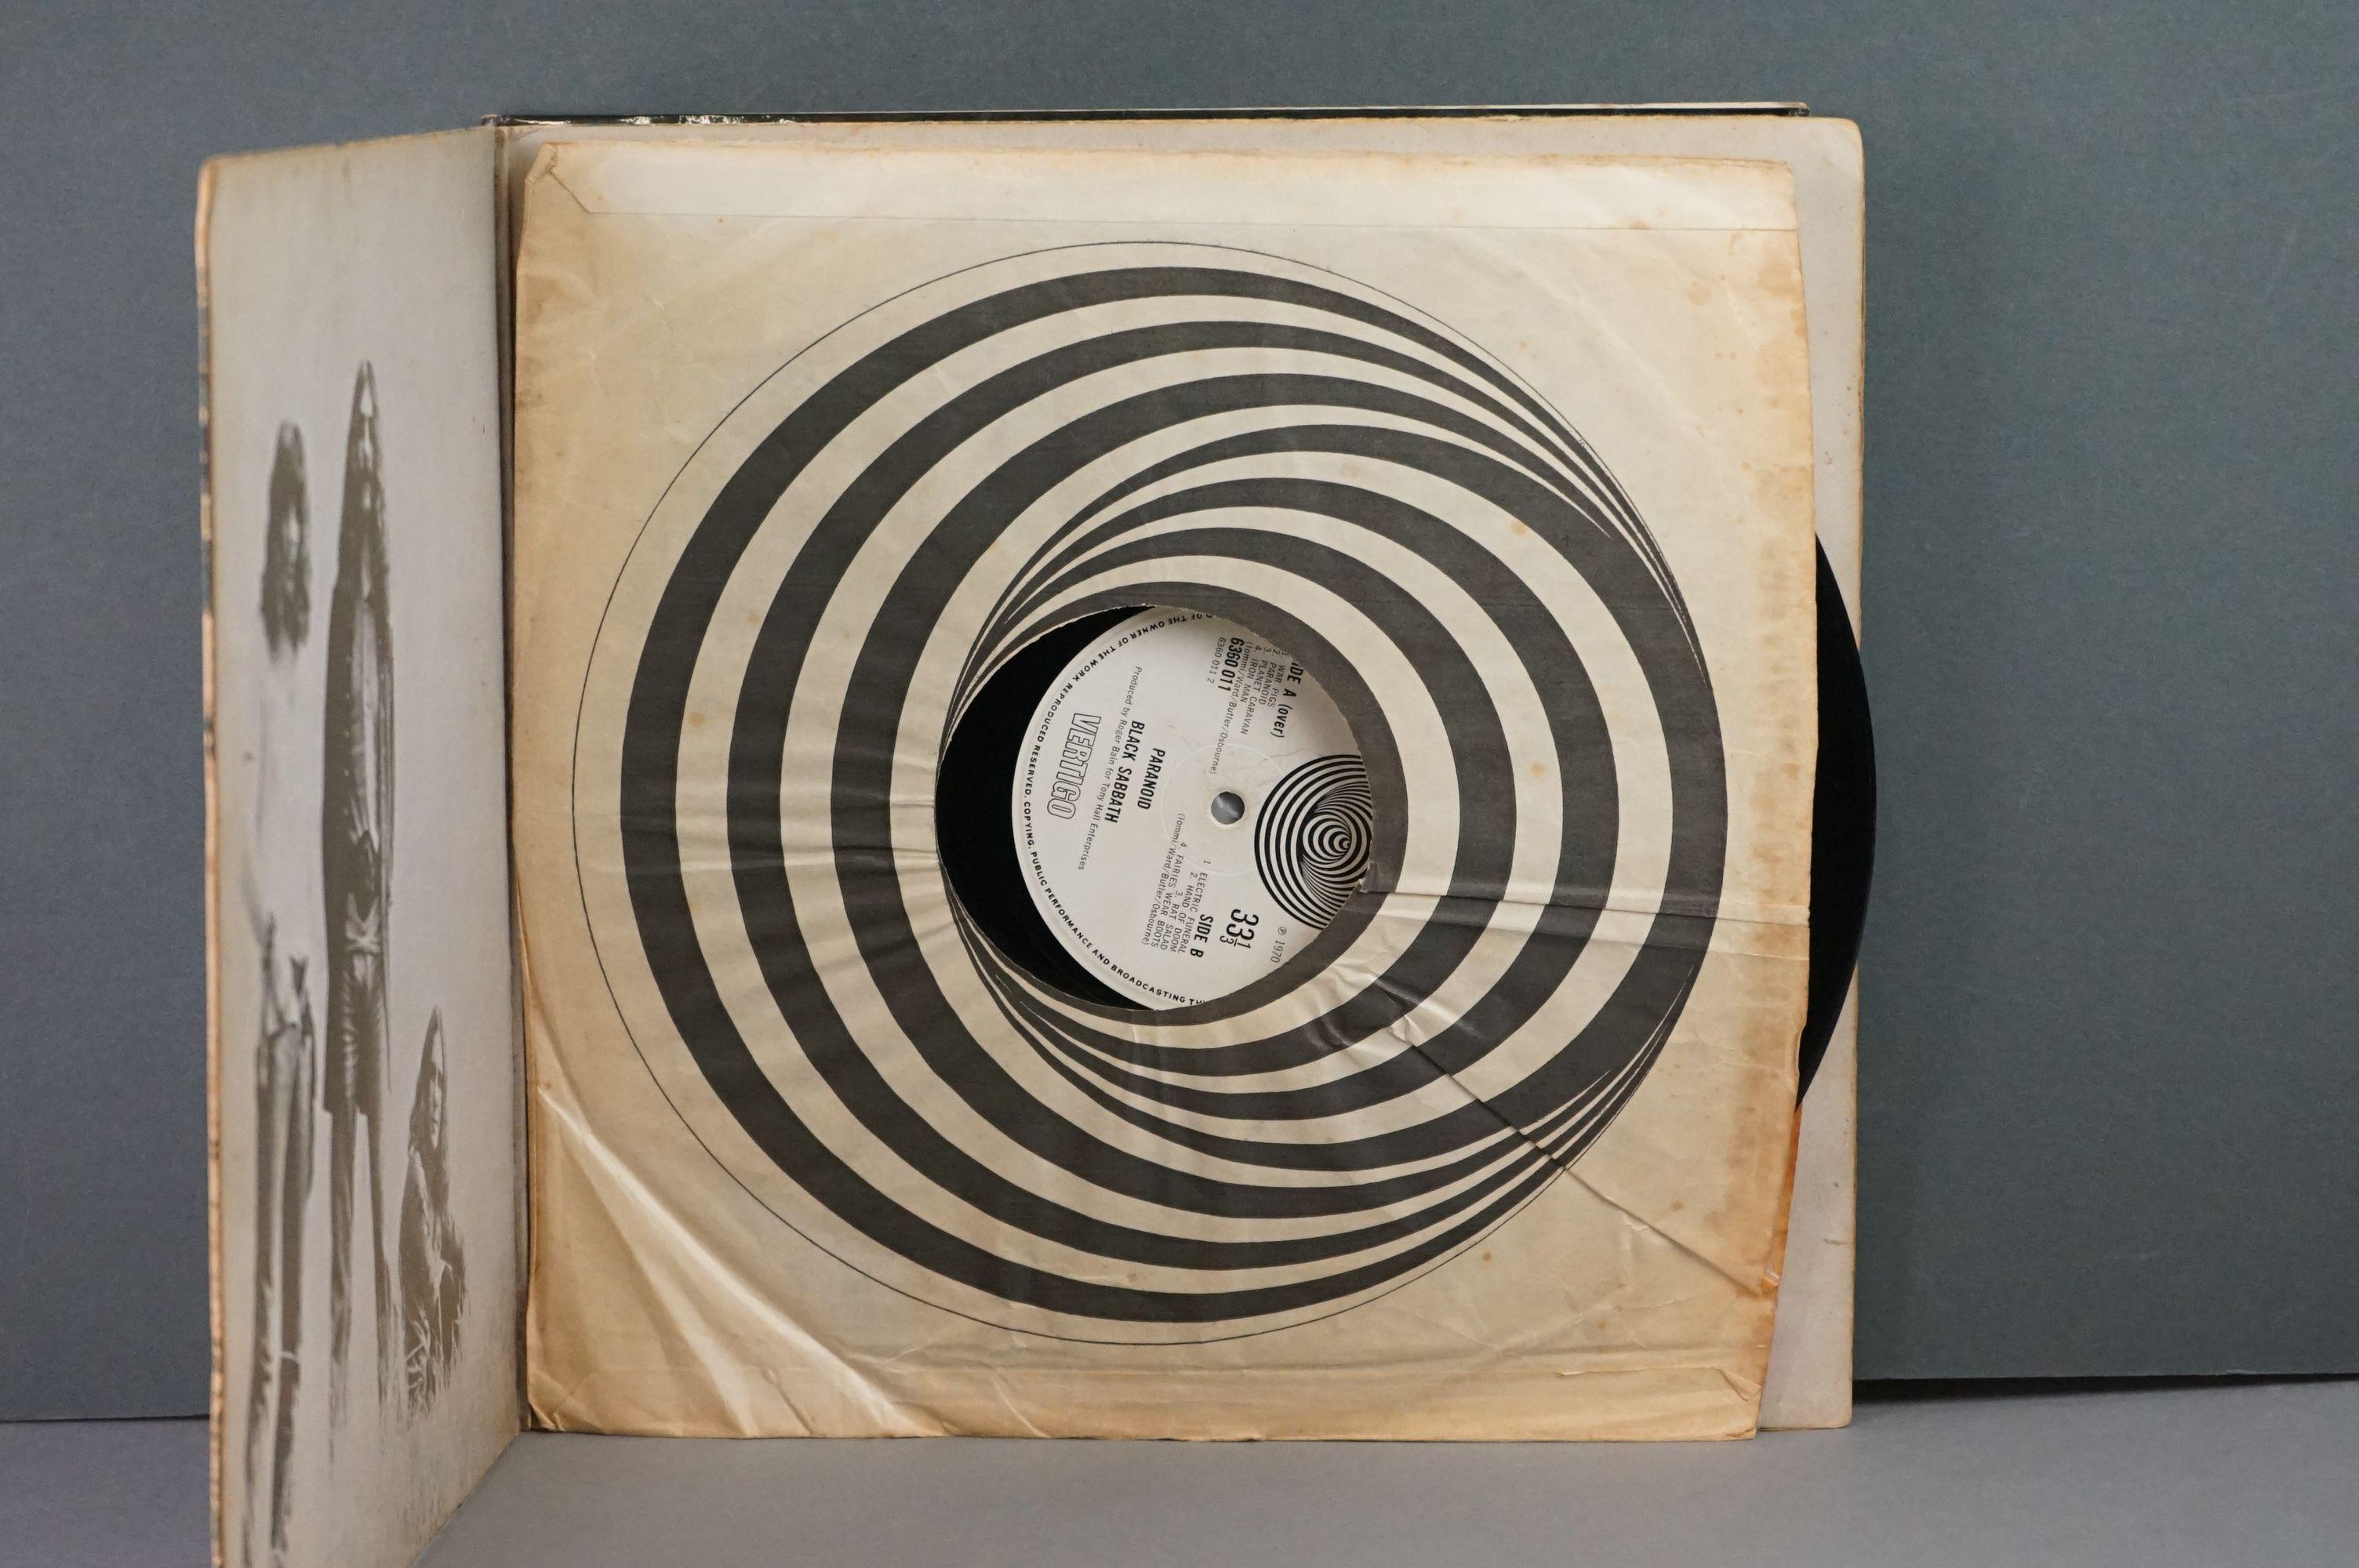 Vinyl - Twelve Black Sabbath vinyl LP's to include Technical Ecstasy (Vertigo Records PRICE 40), - Image 16 of 17